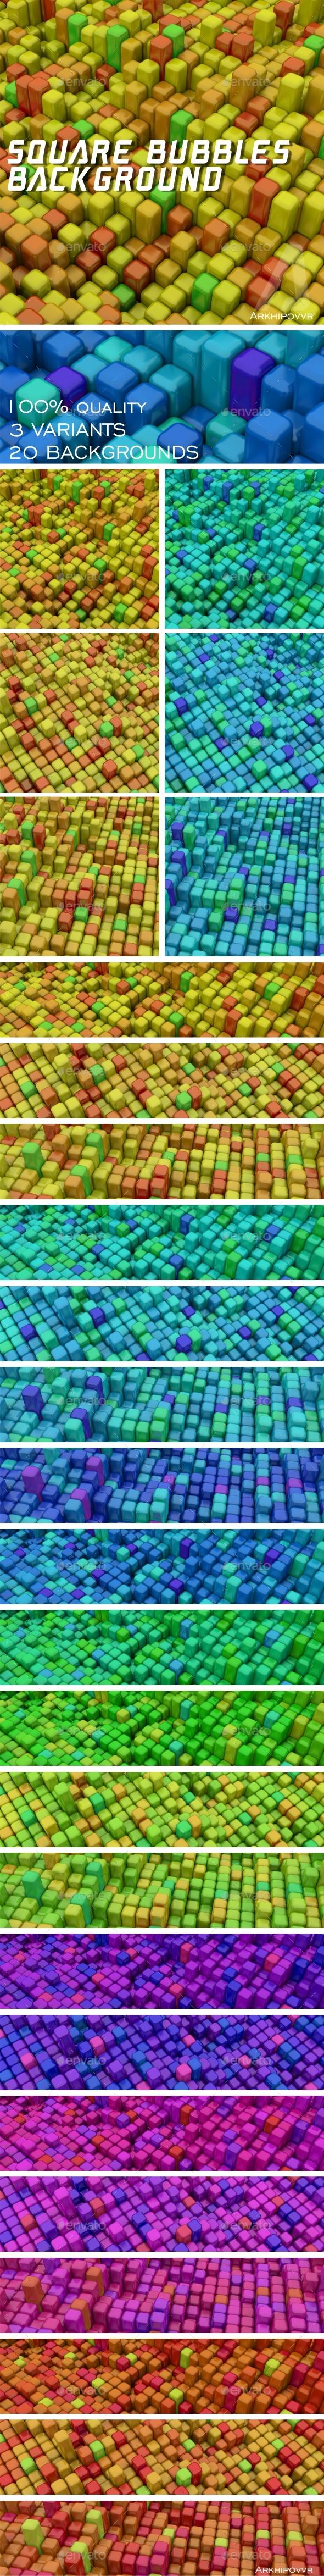 Square Bubbles Backgrounds - Backgrounds Graphics